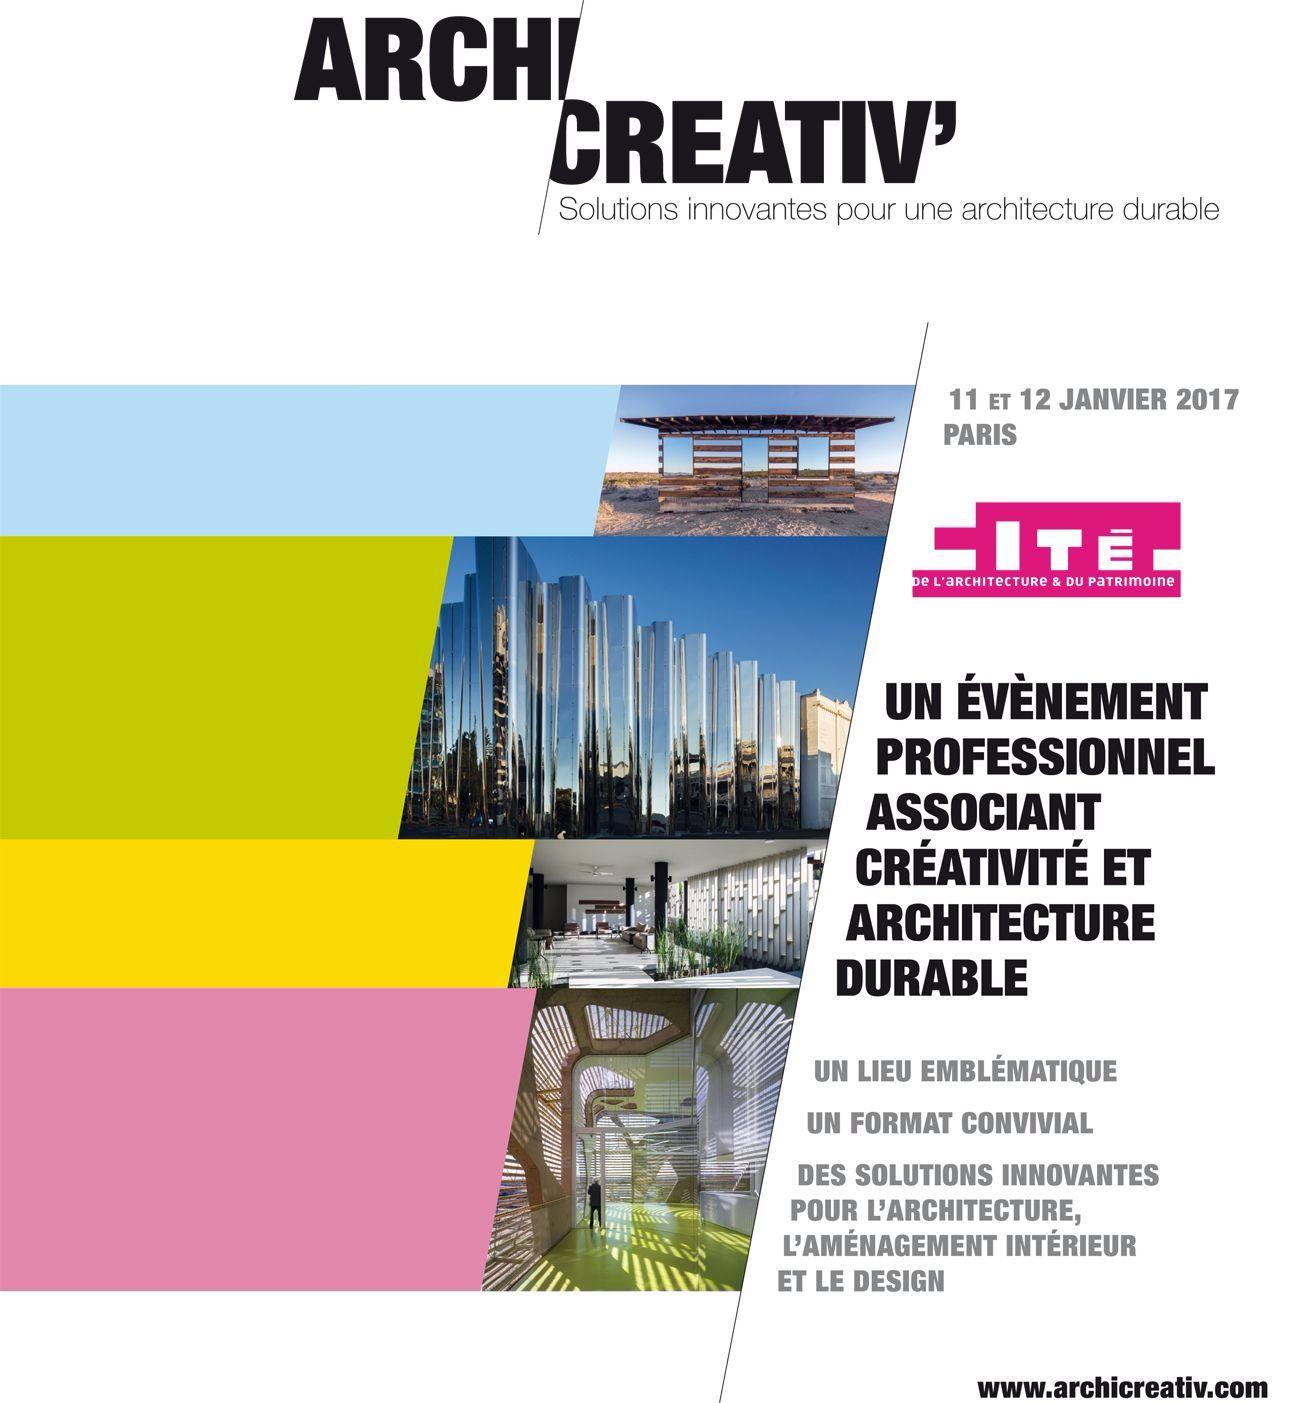 Archicreativ', un événement BeeMedias et ThemaDesign